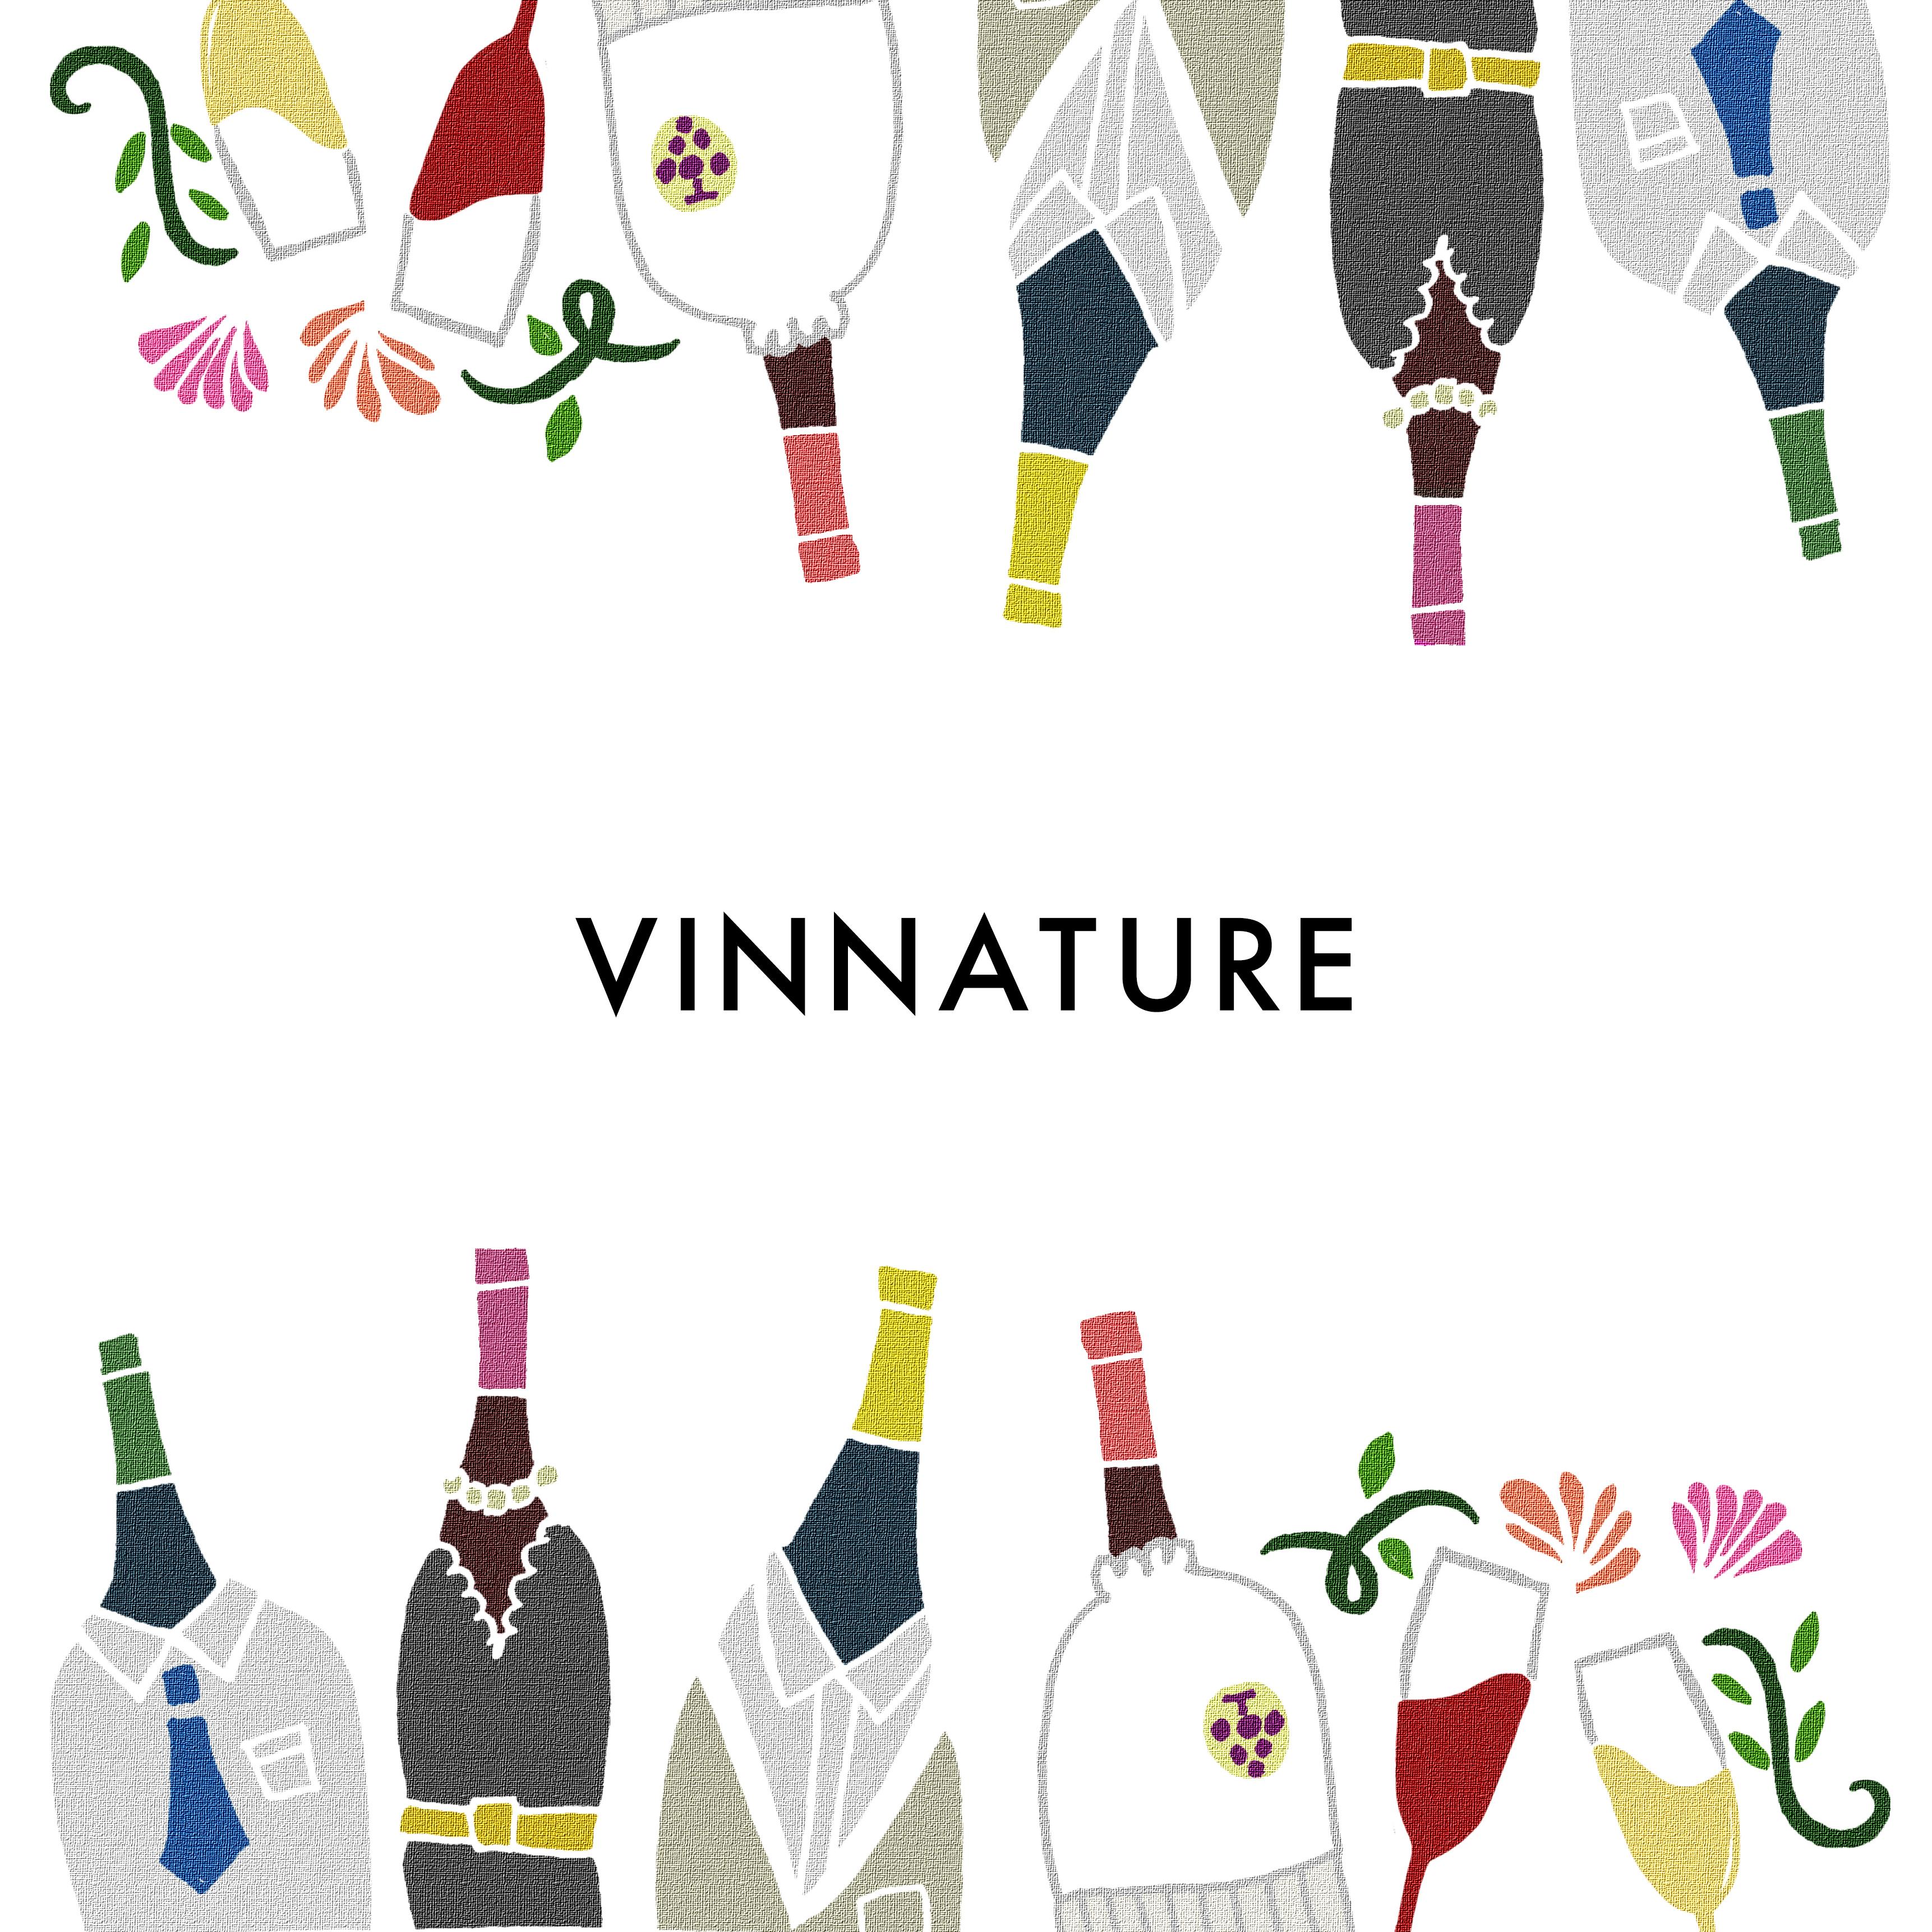 vinnature